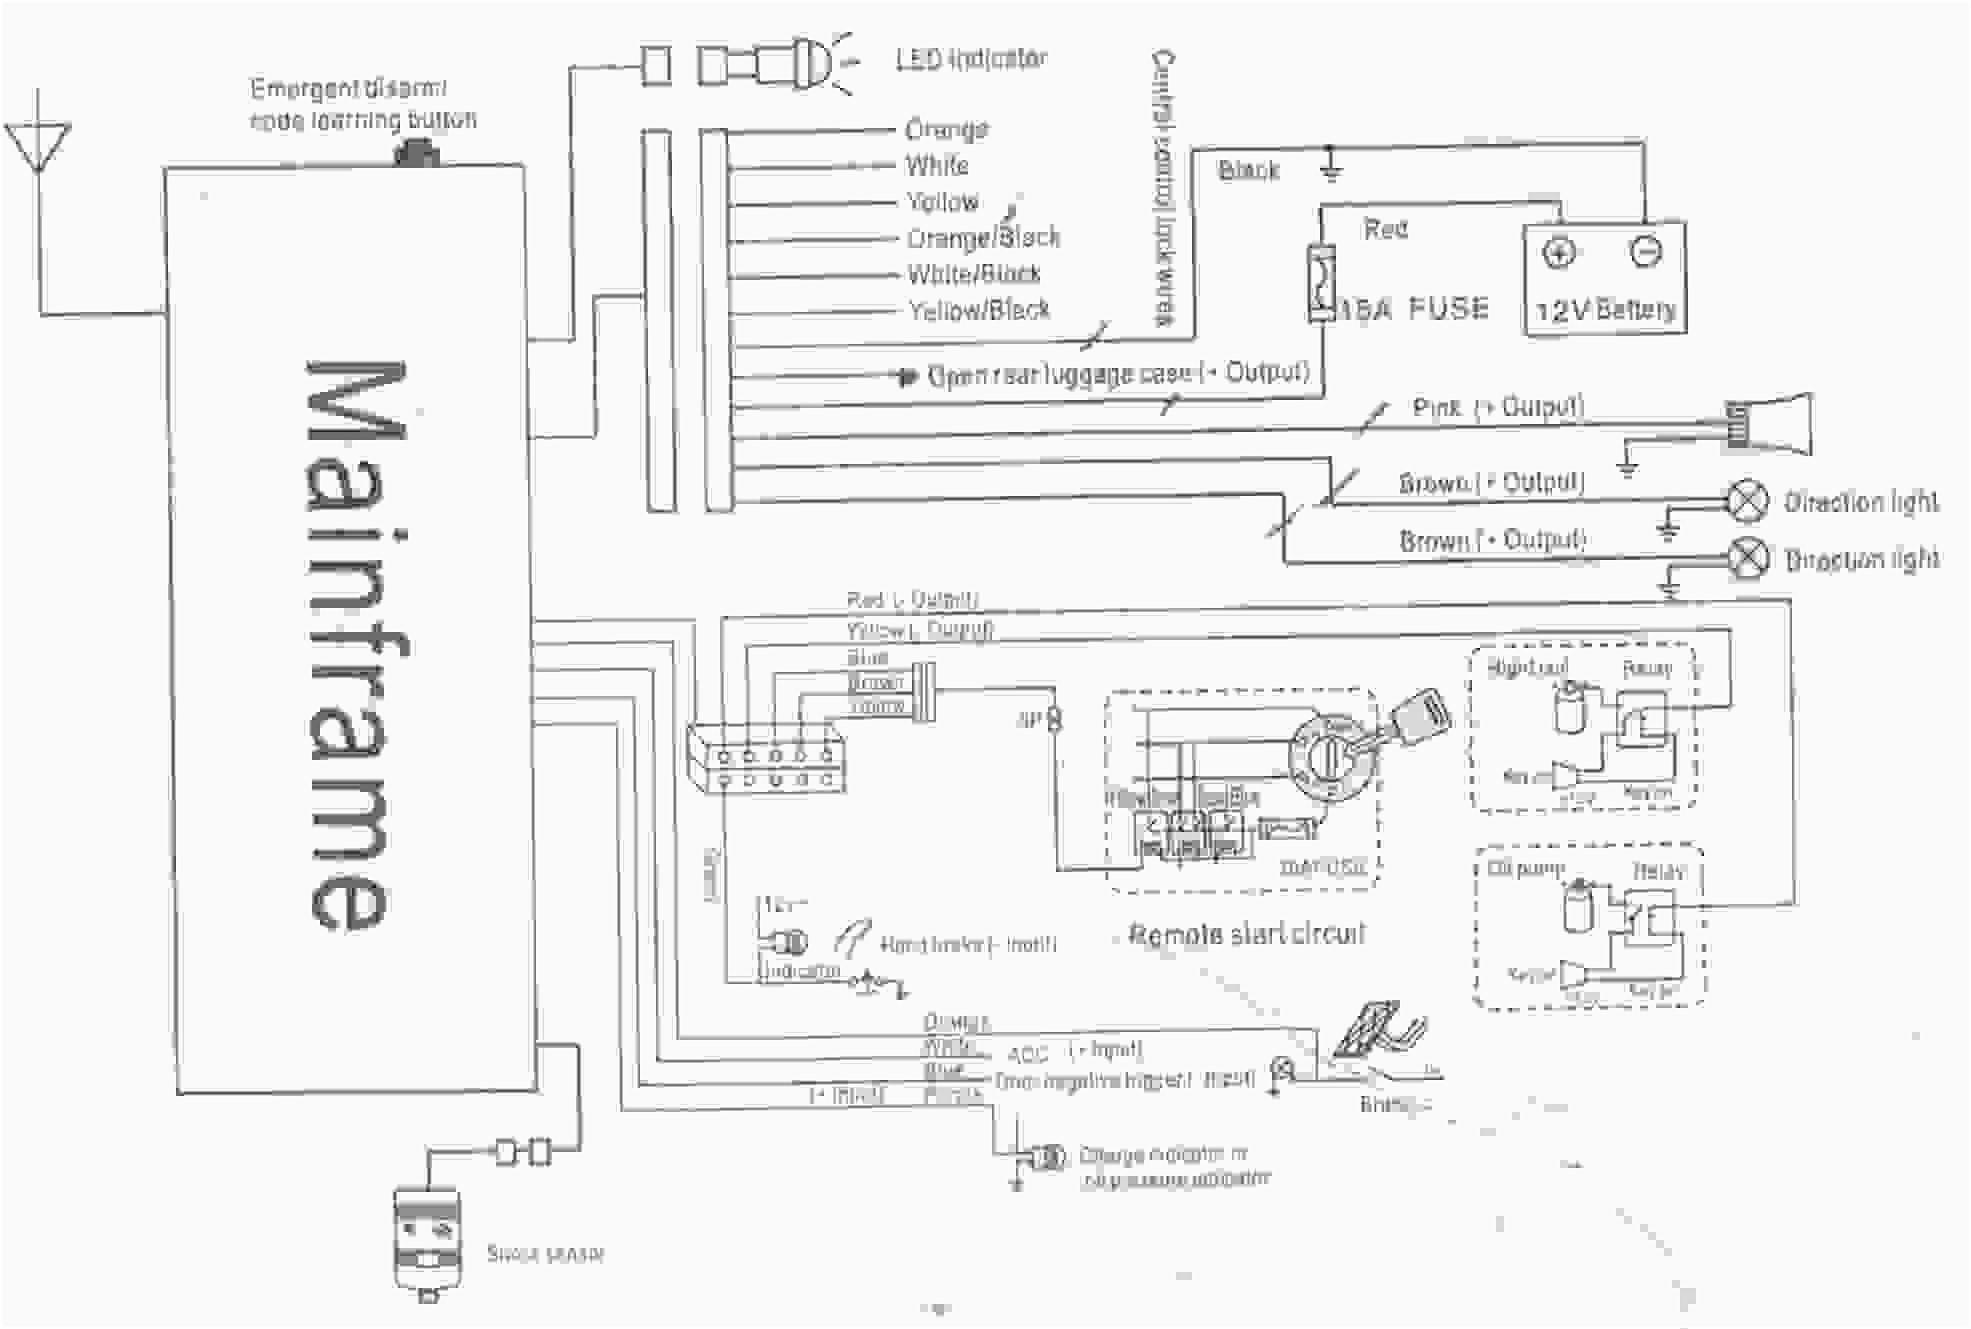 5706 Viper Alarm Wiring Diagram 81b46 Wiring Diagram for Clifford Car Alarm Of 5706 Viper Alarm Wiring Diagram